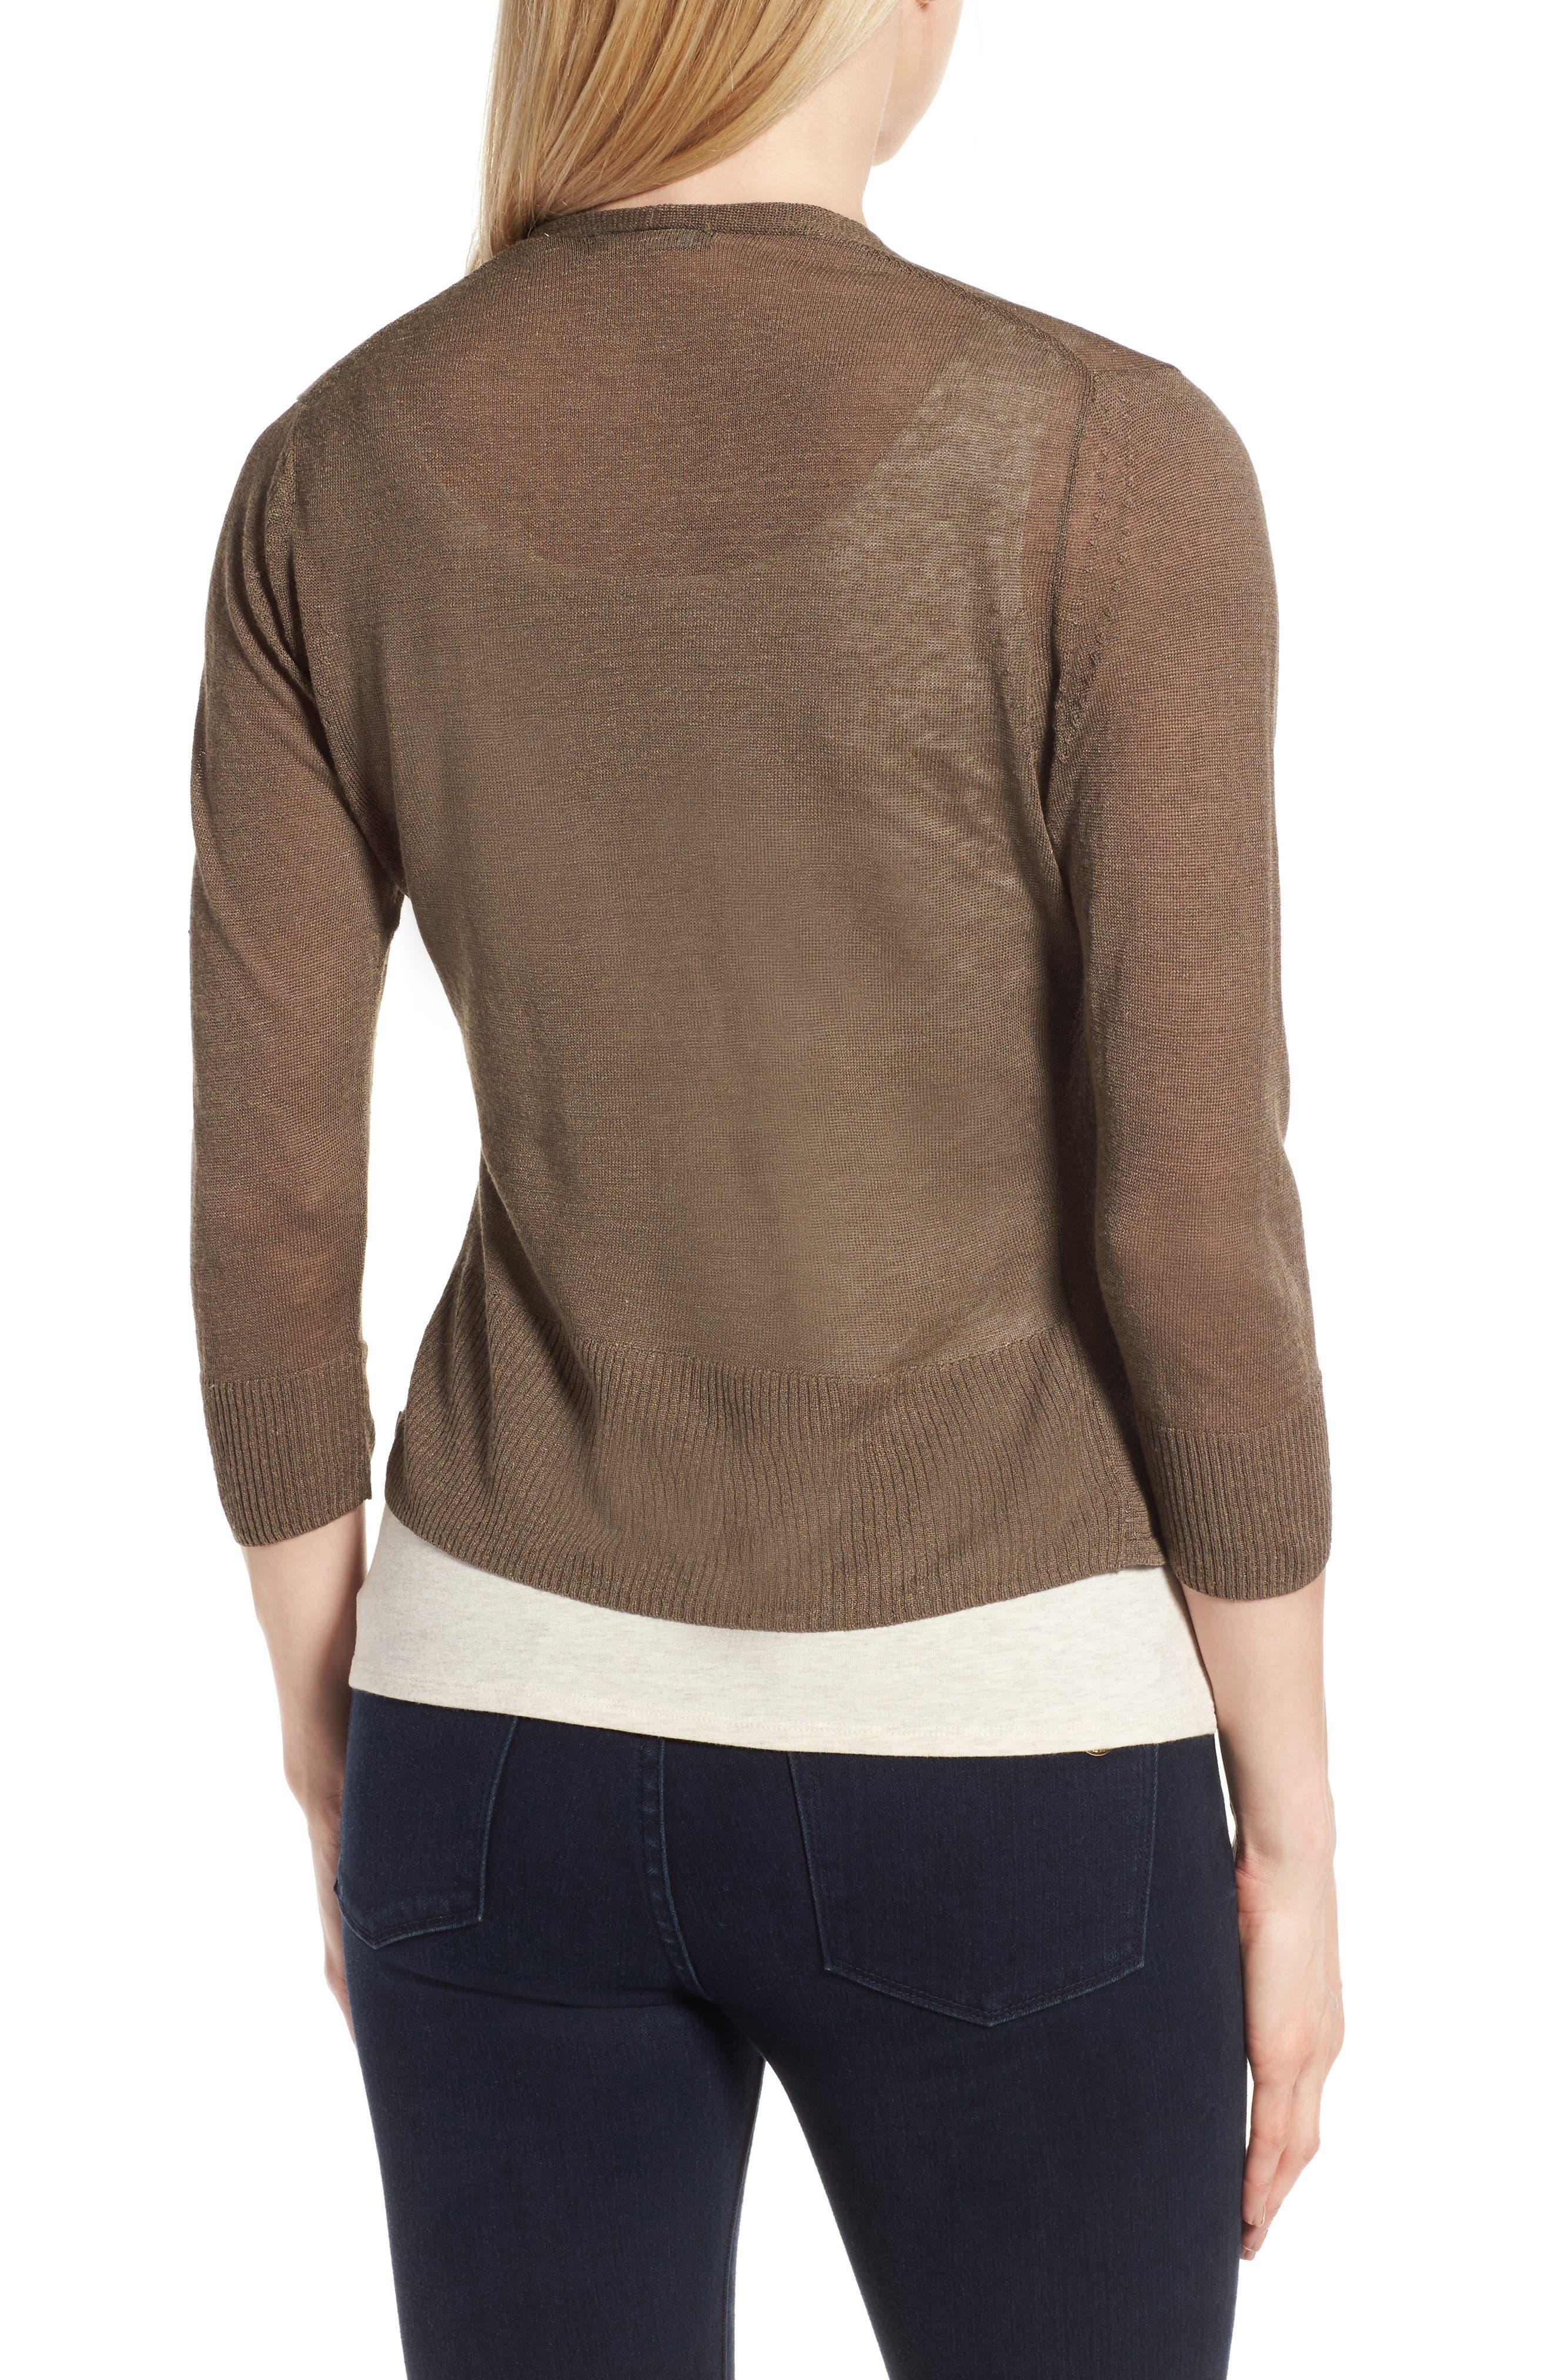 Alternate Image 2  - NIC+ZOE '4-Way' Convertible Three Quarter Sleeve Cardigan (Regular and Petite)